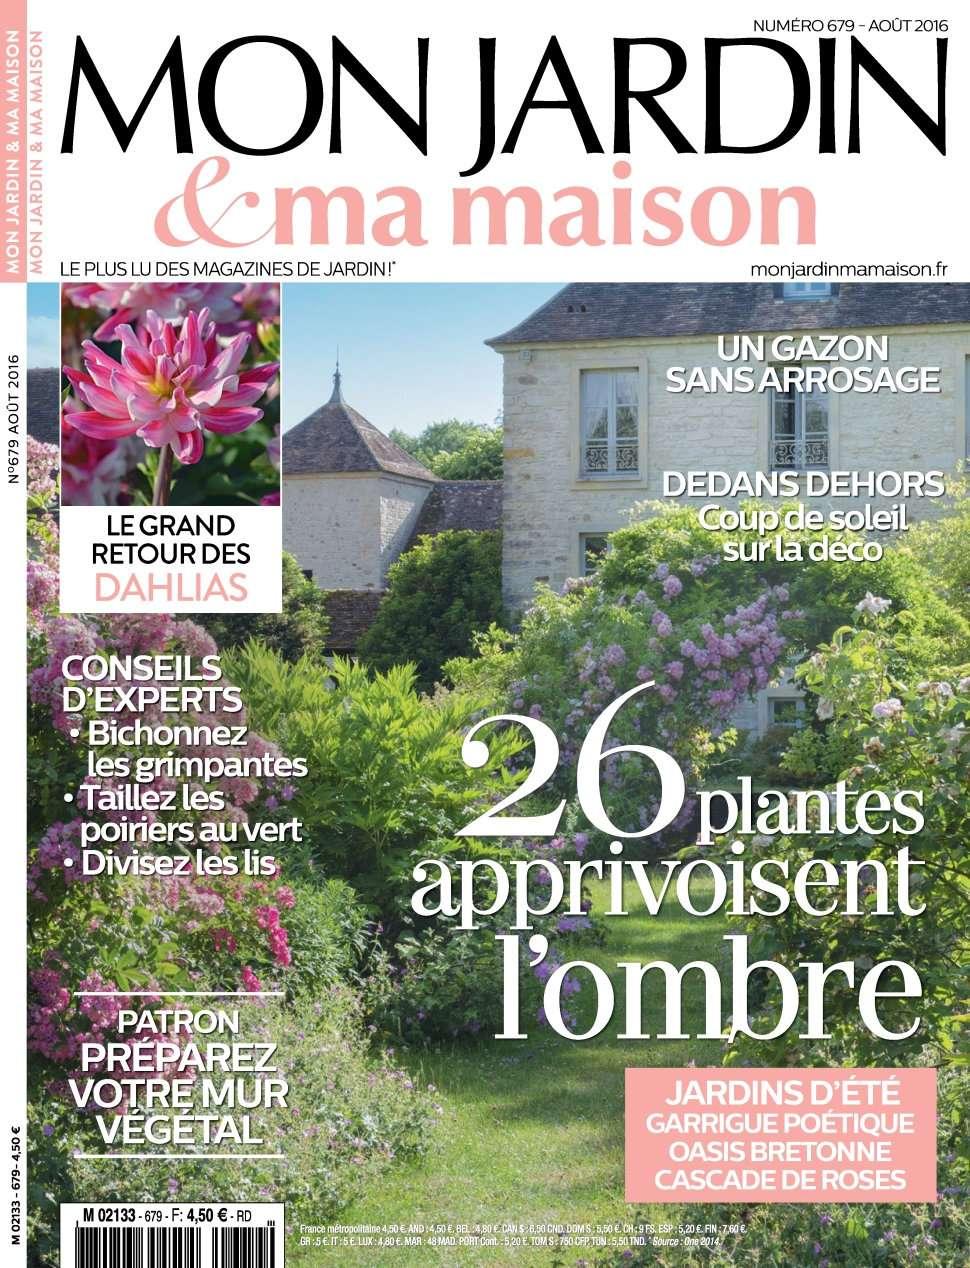 Mon Jardin & Ma Maison 679 - Aout 2016